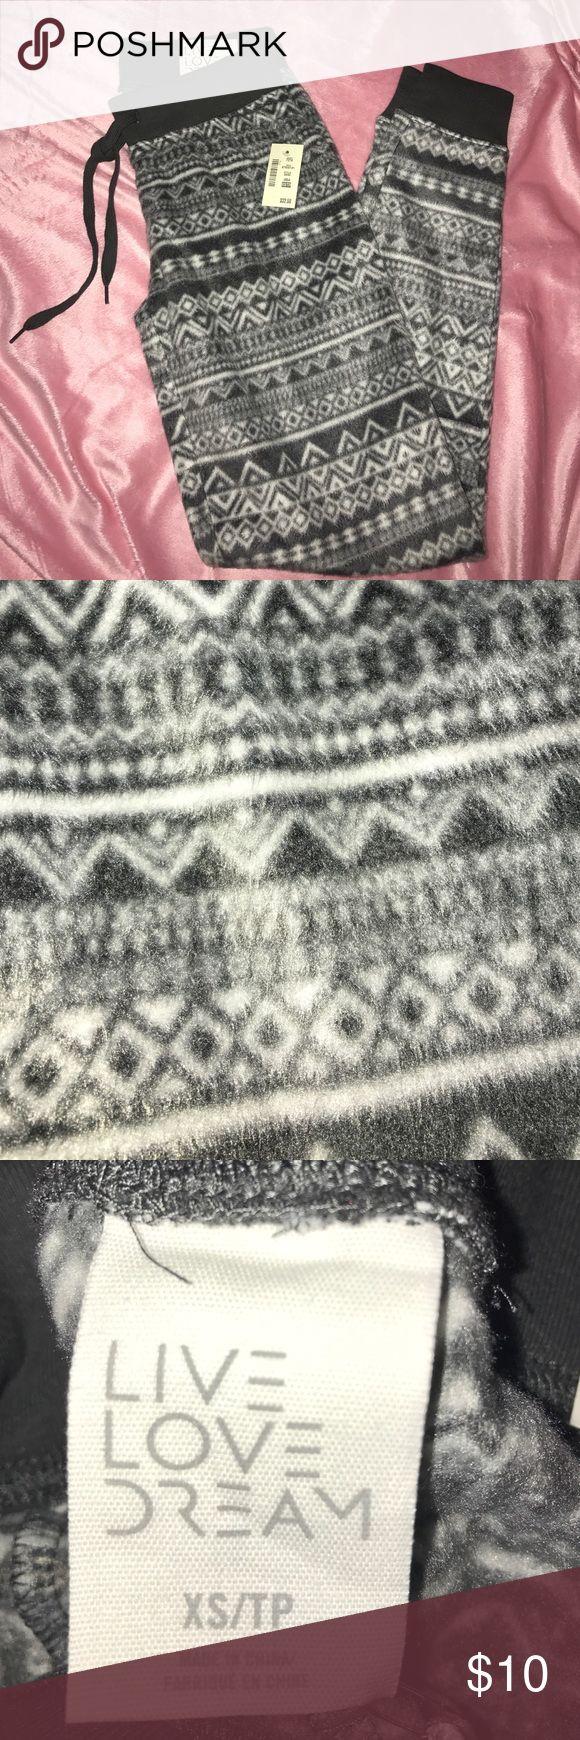 Fleece Joggers Grey and white tribal printed fleece pajama/jogger pants, super soft, never worn Intimates & Sleepwear Pajamas